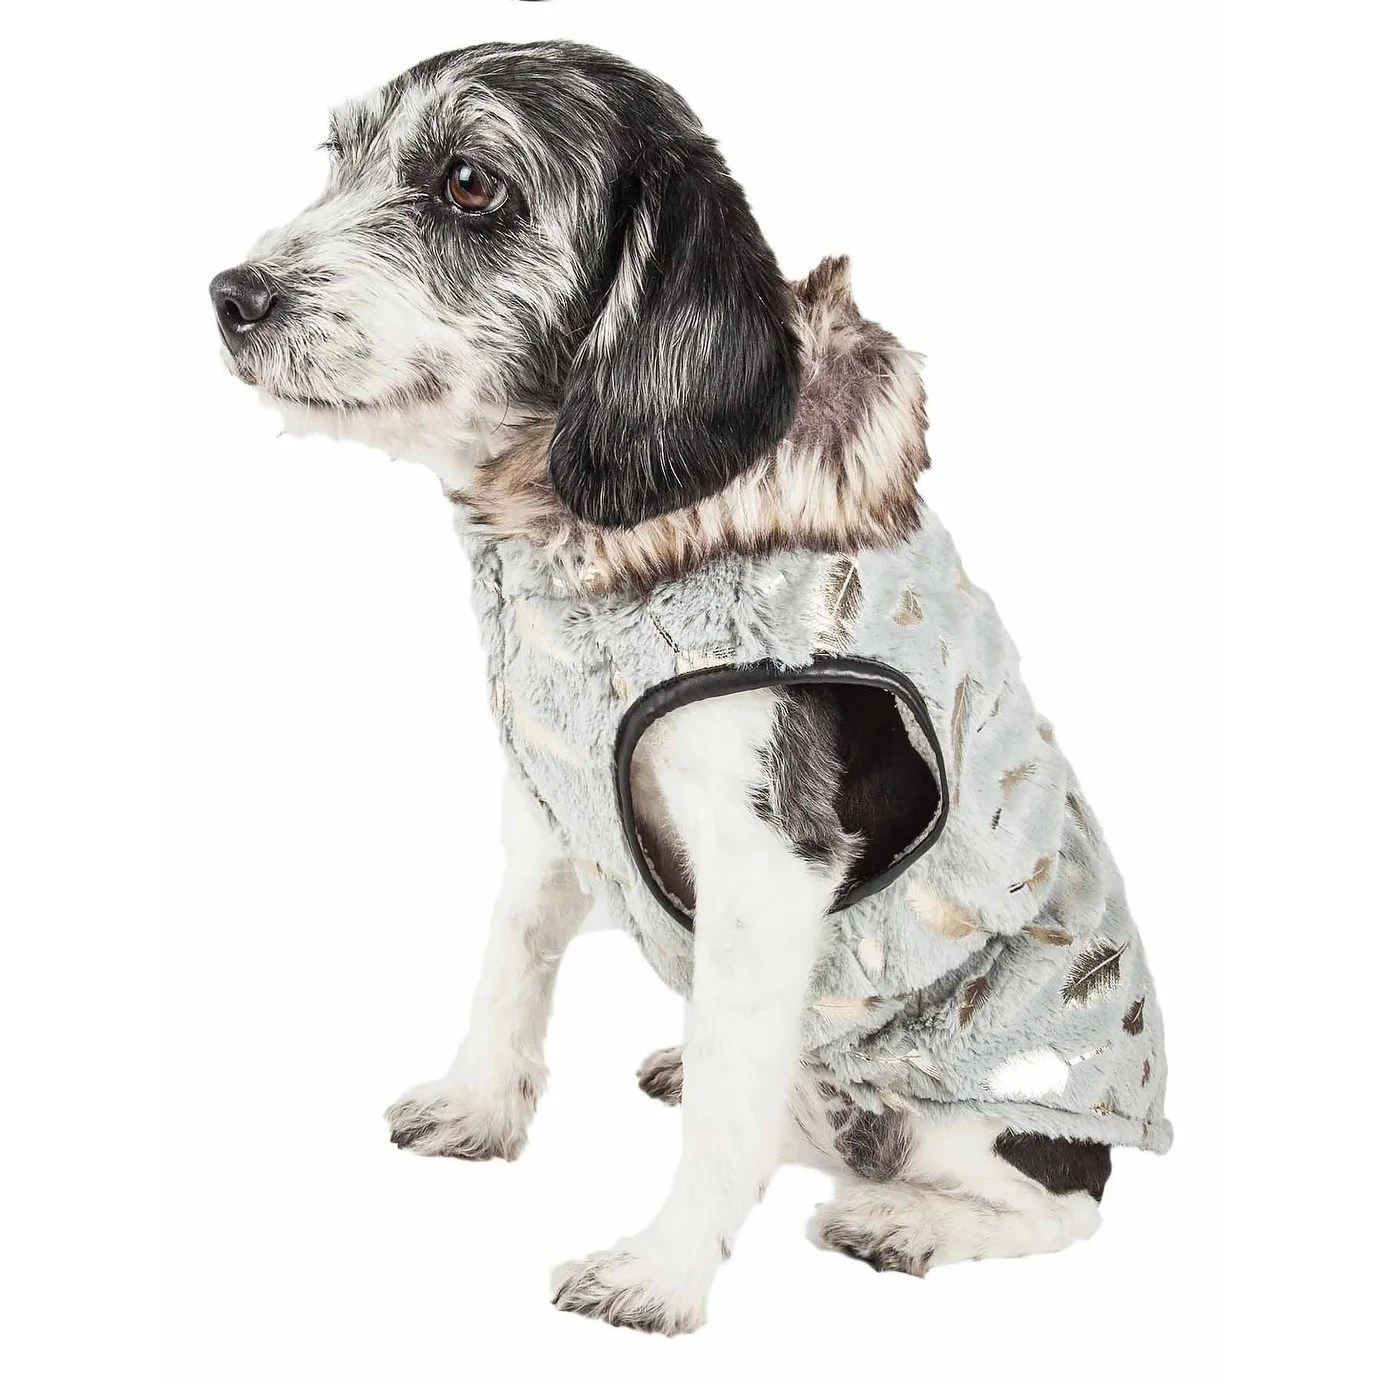 Buy Dog Apparel Online at Overstock.com